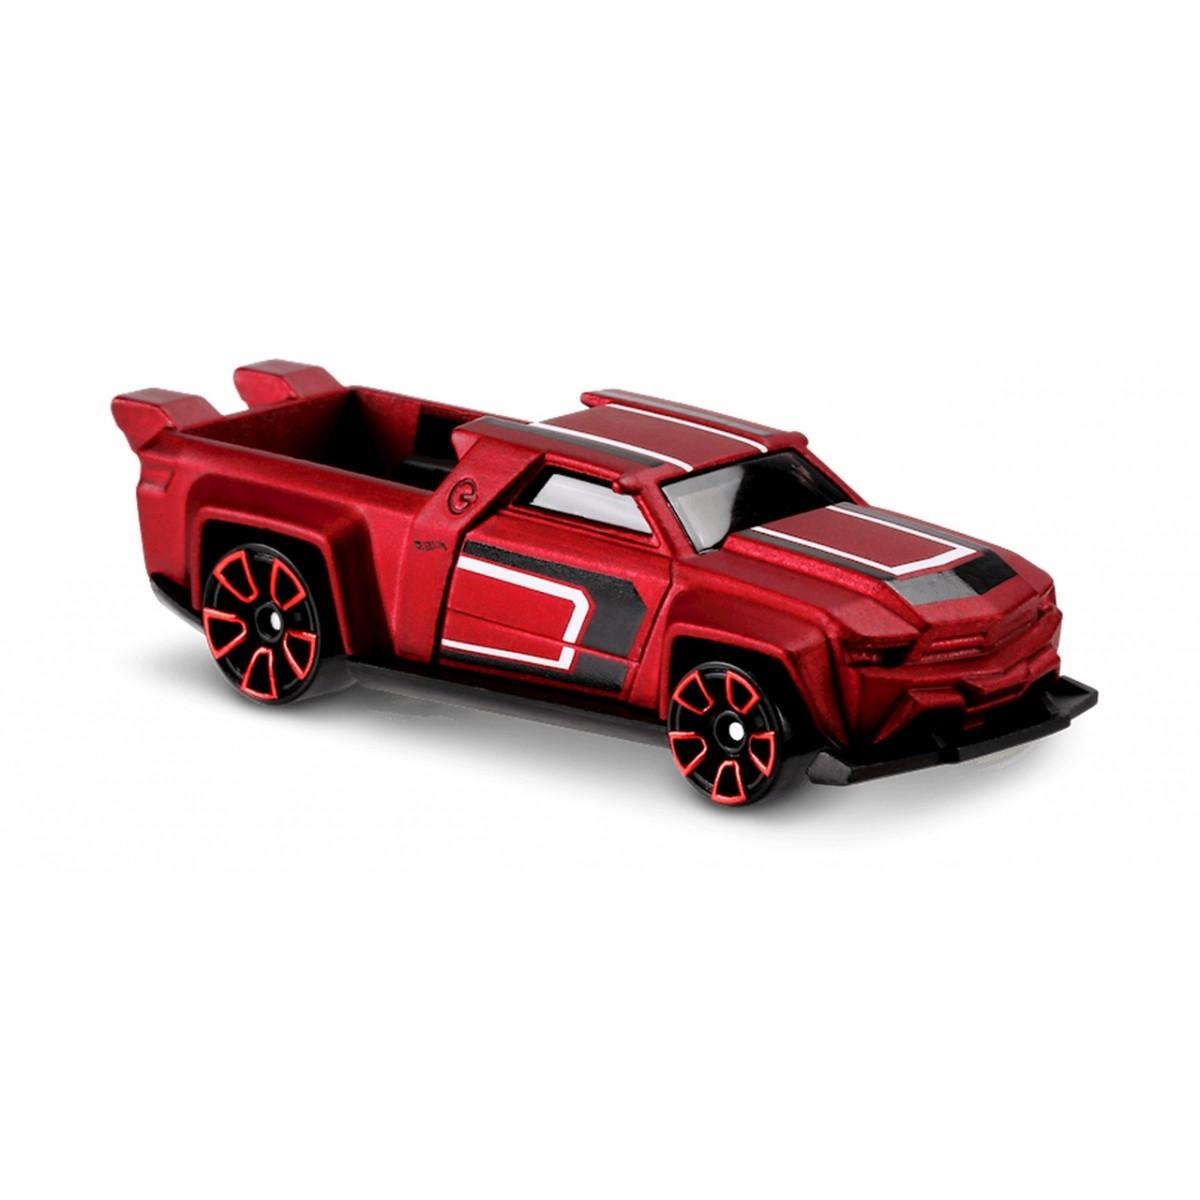 Carrinho Hot Wheels: Solid Muscle Vermelho